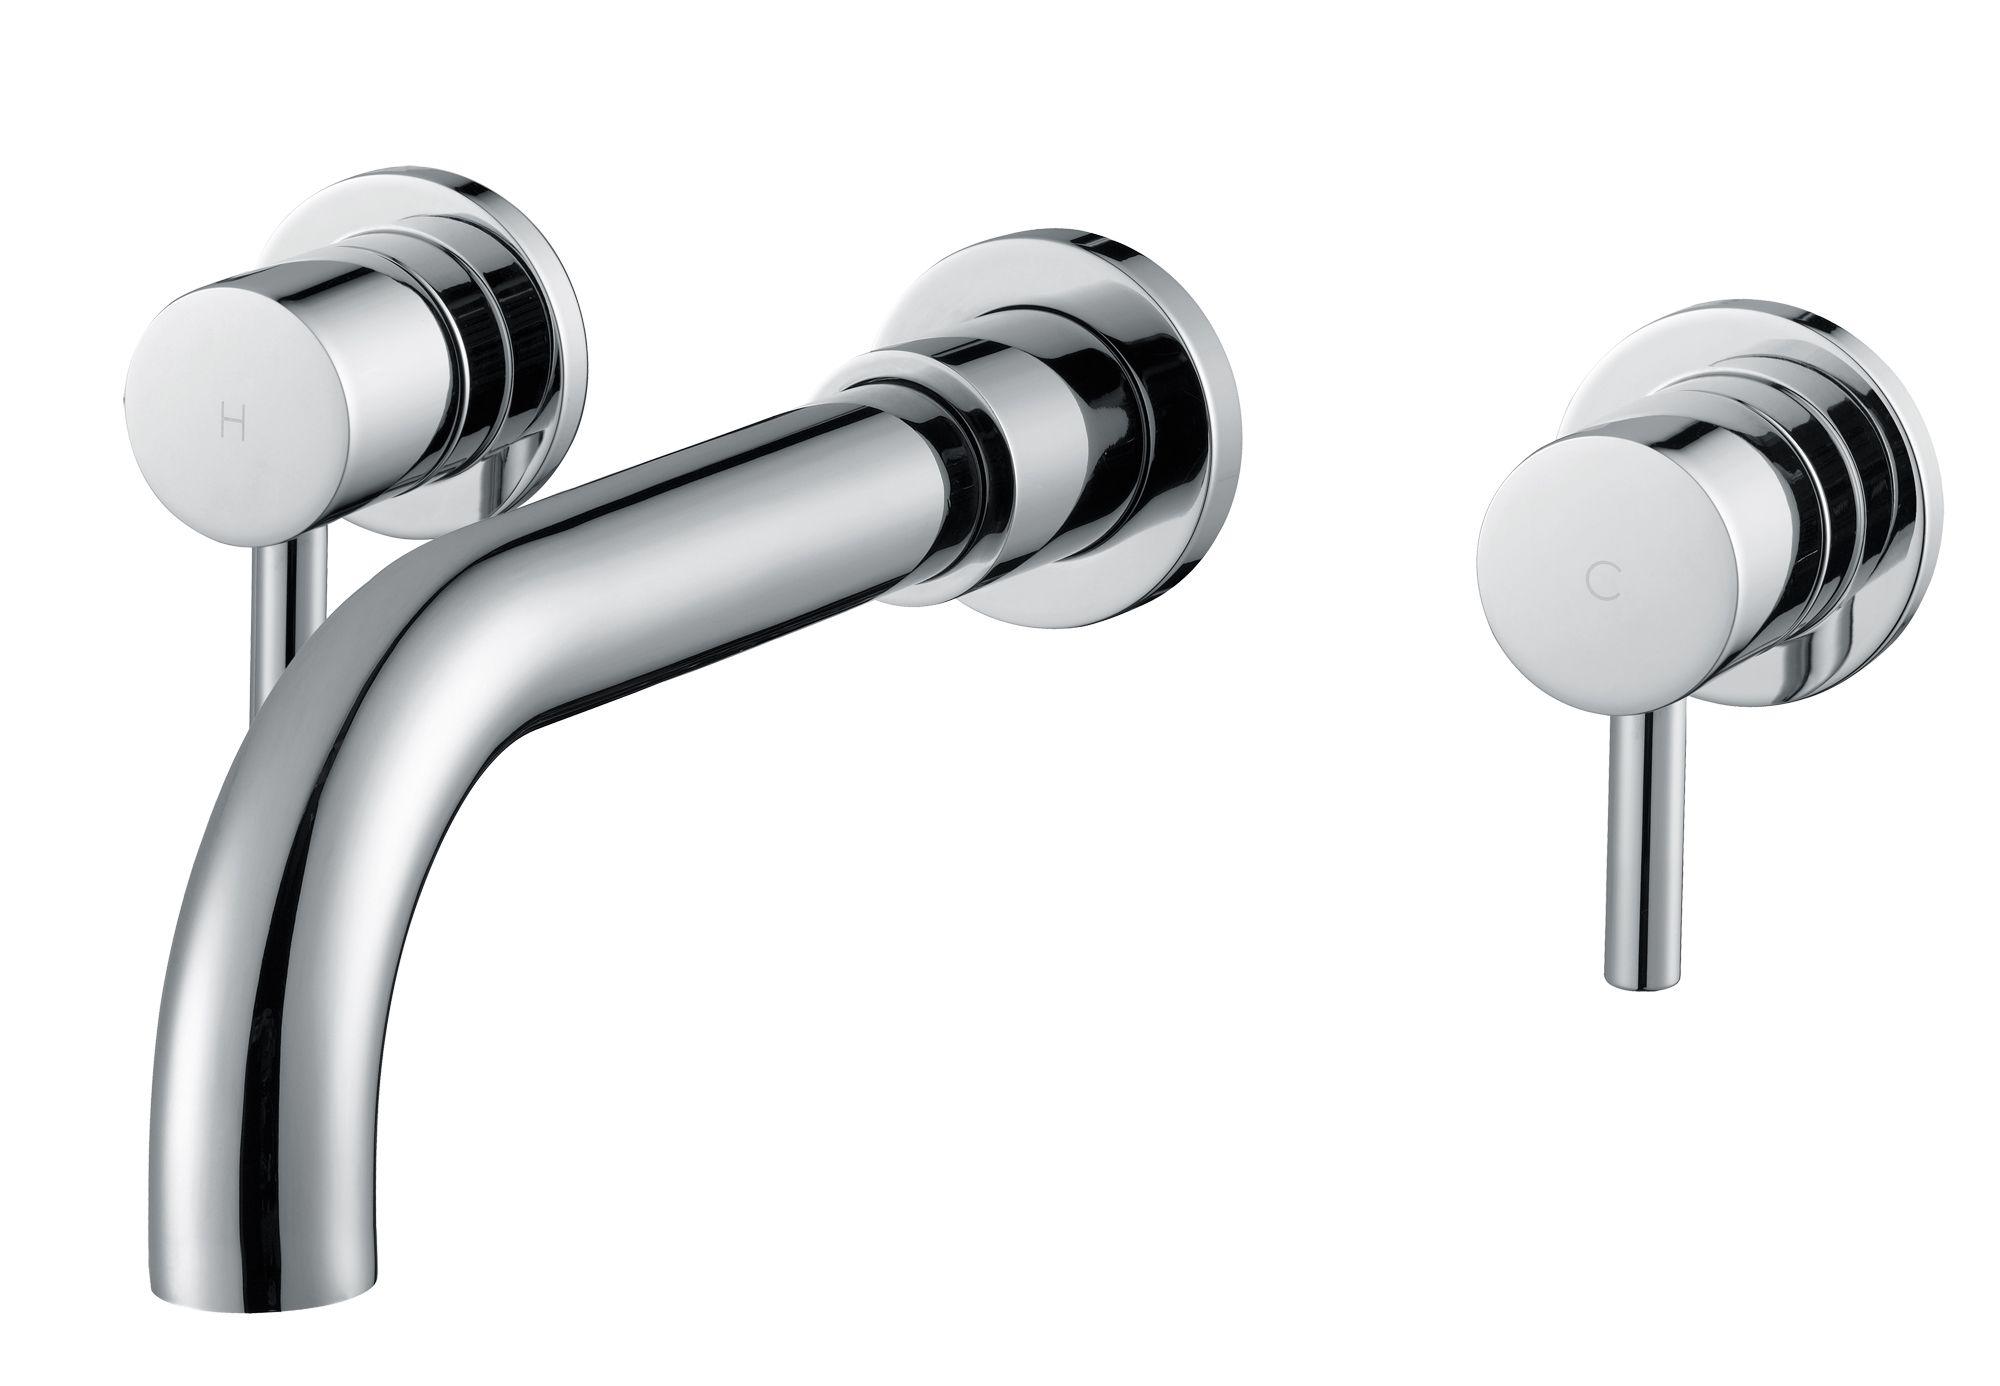 Cooke lewis minima chrome wall mounted bath mixer tap for B q bathroom accessories